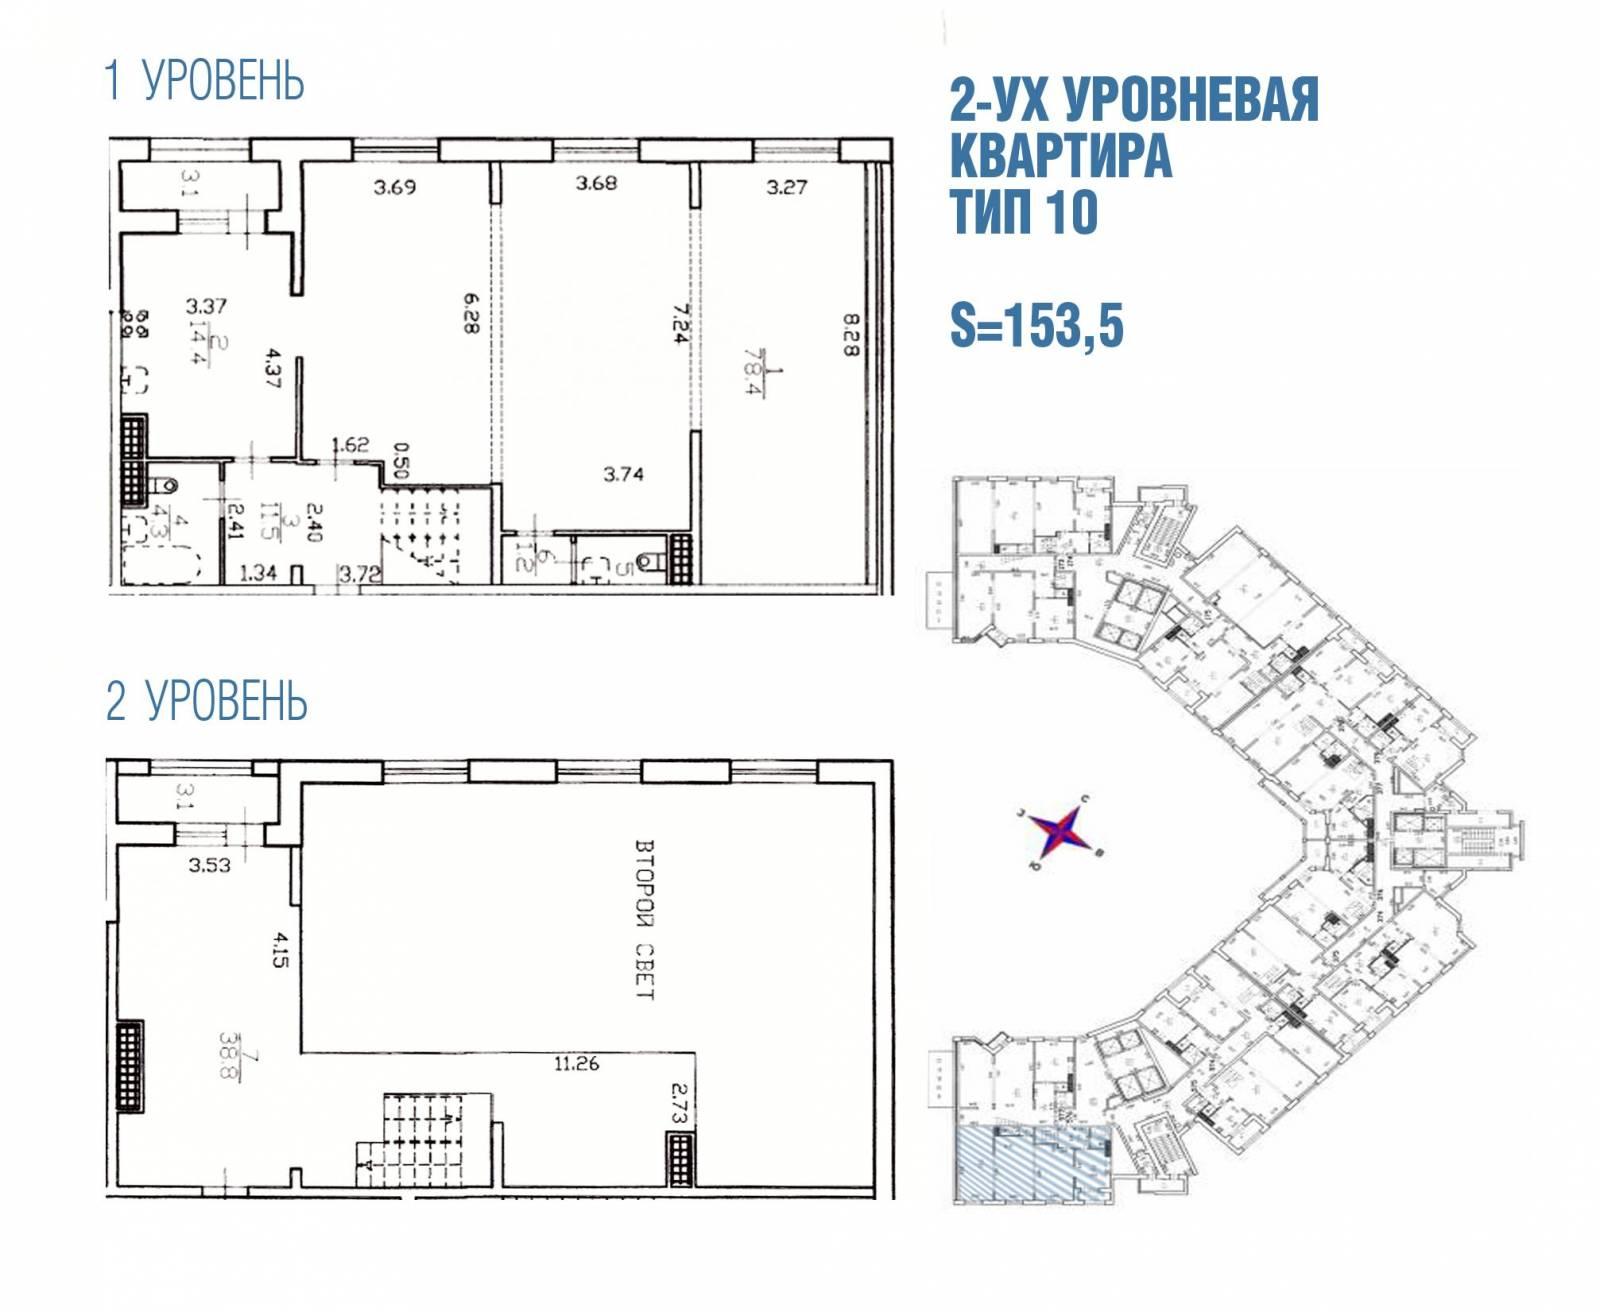 Двухуровневая квартира тип 10 S=153,5